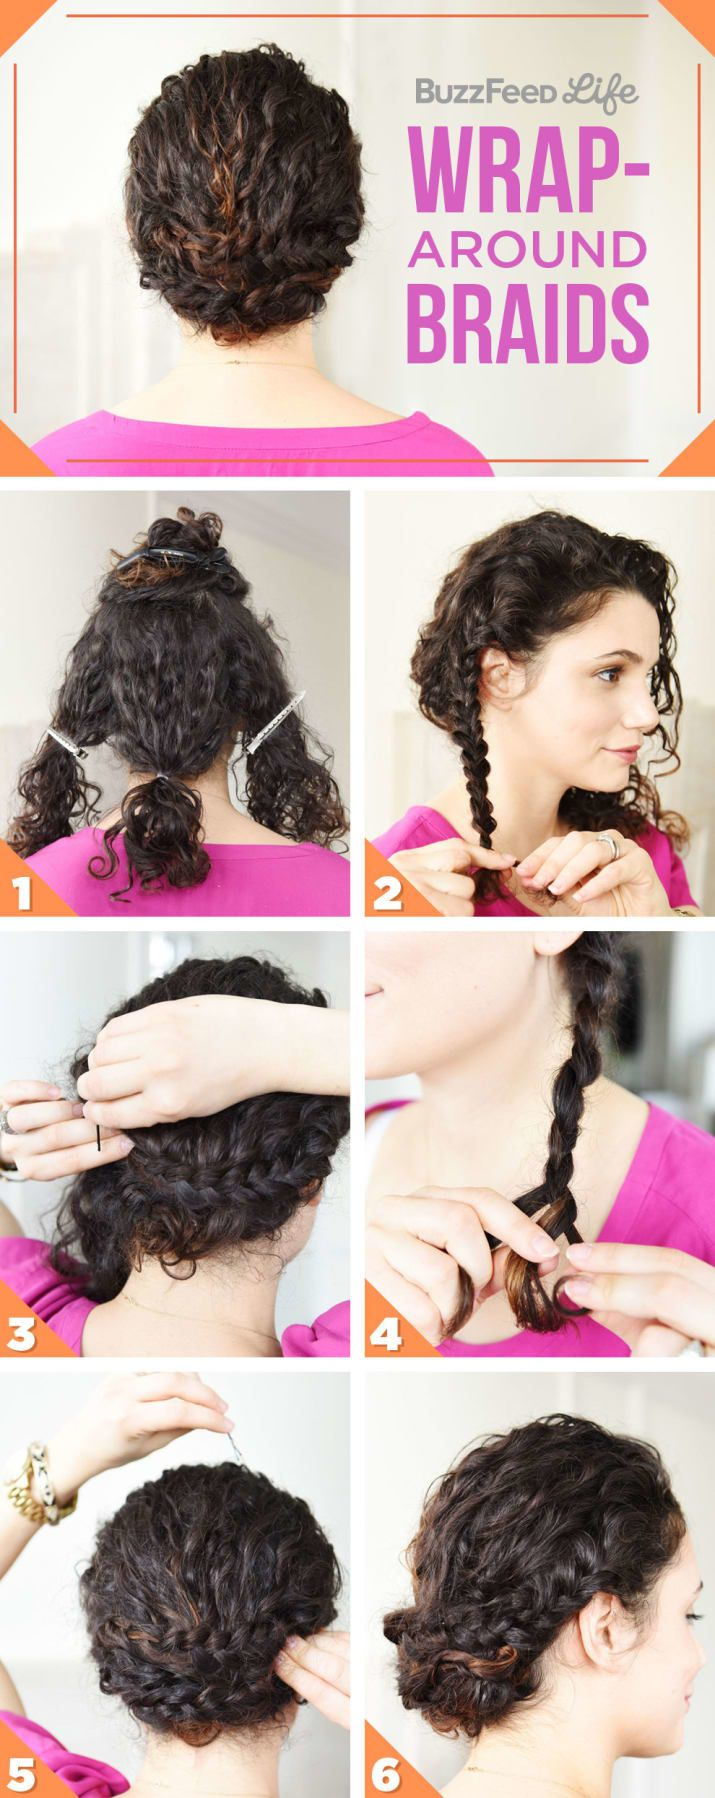 hairdos for curly hair 8 - Hairdos for Curly Hair